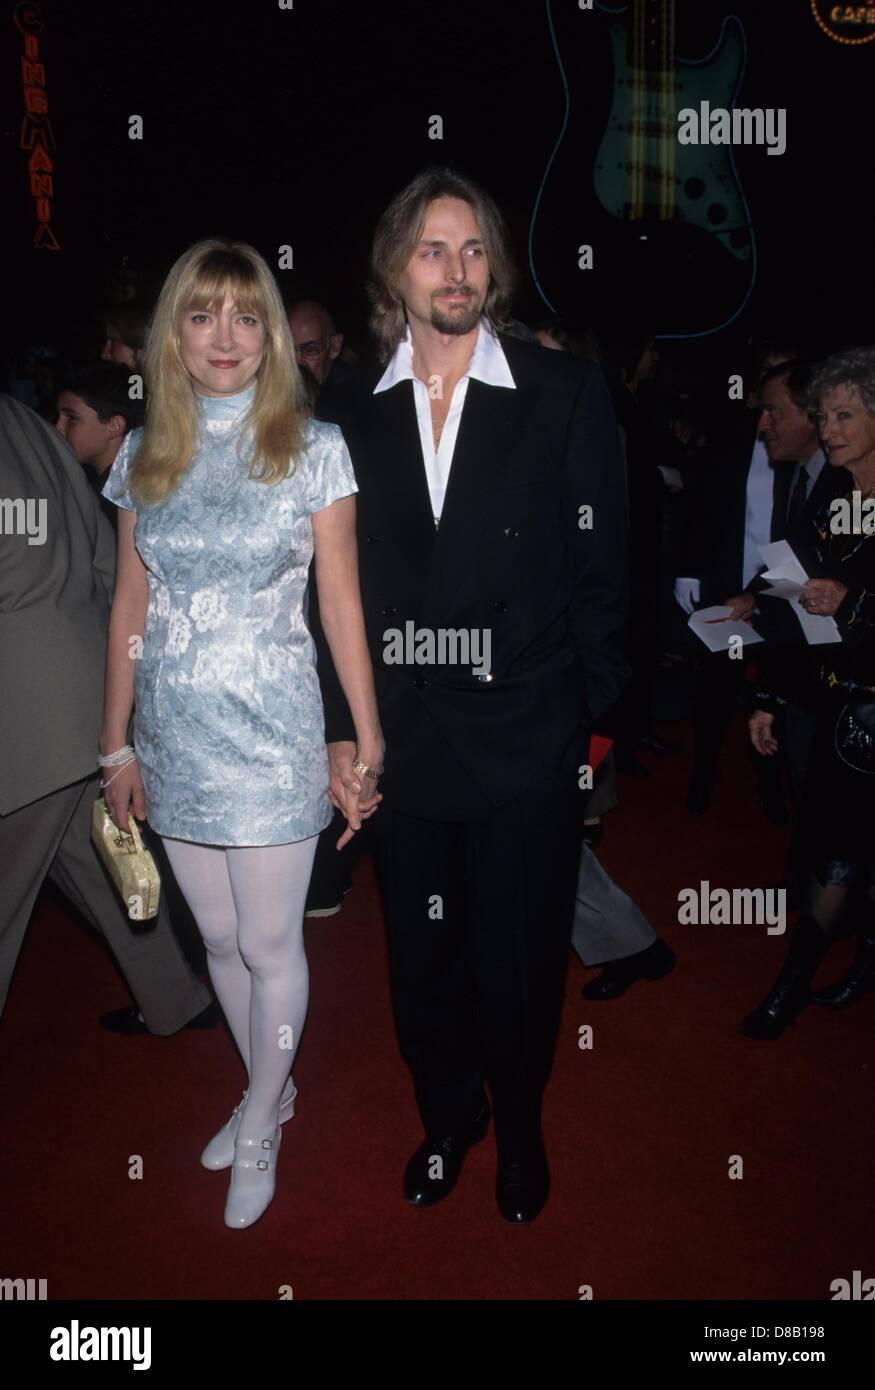 GLENNE HEADLY with husband at the SGT. BILKO premiere 1996.k4392fb.(Credit Image: © Fitzroy Barrett/Globe Photos/ZUMAPRESS.com) - Stock Image